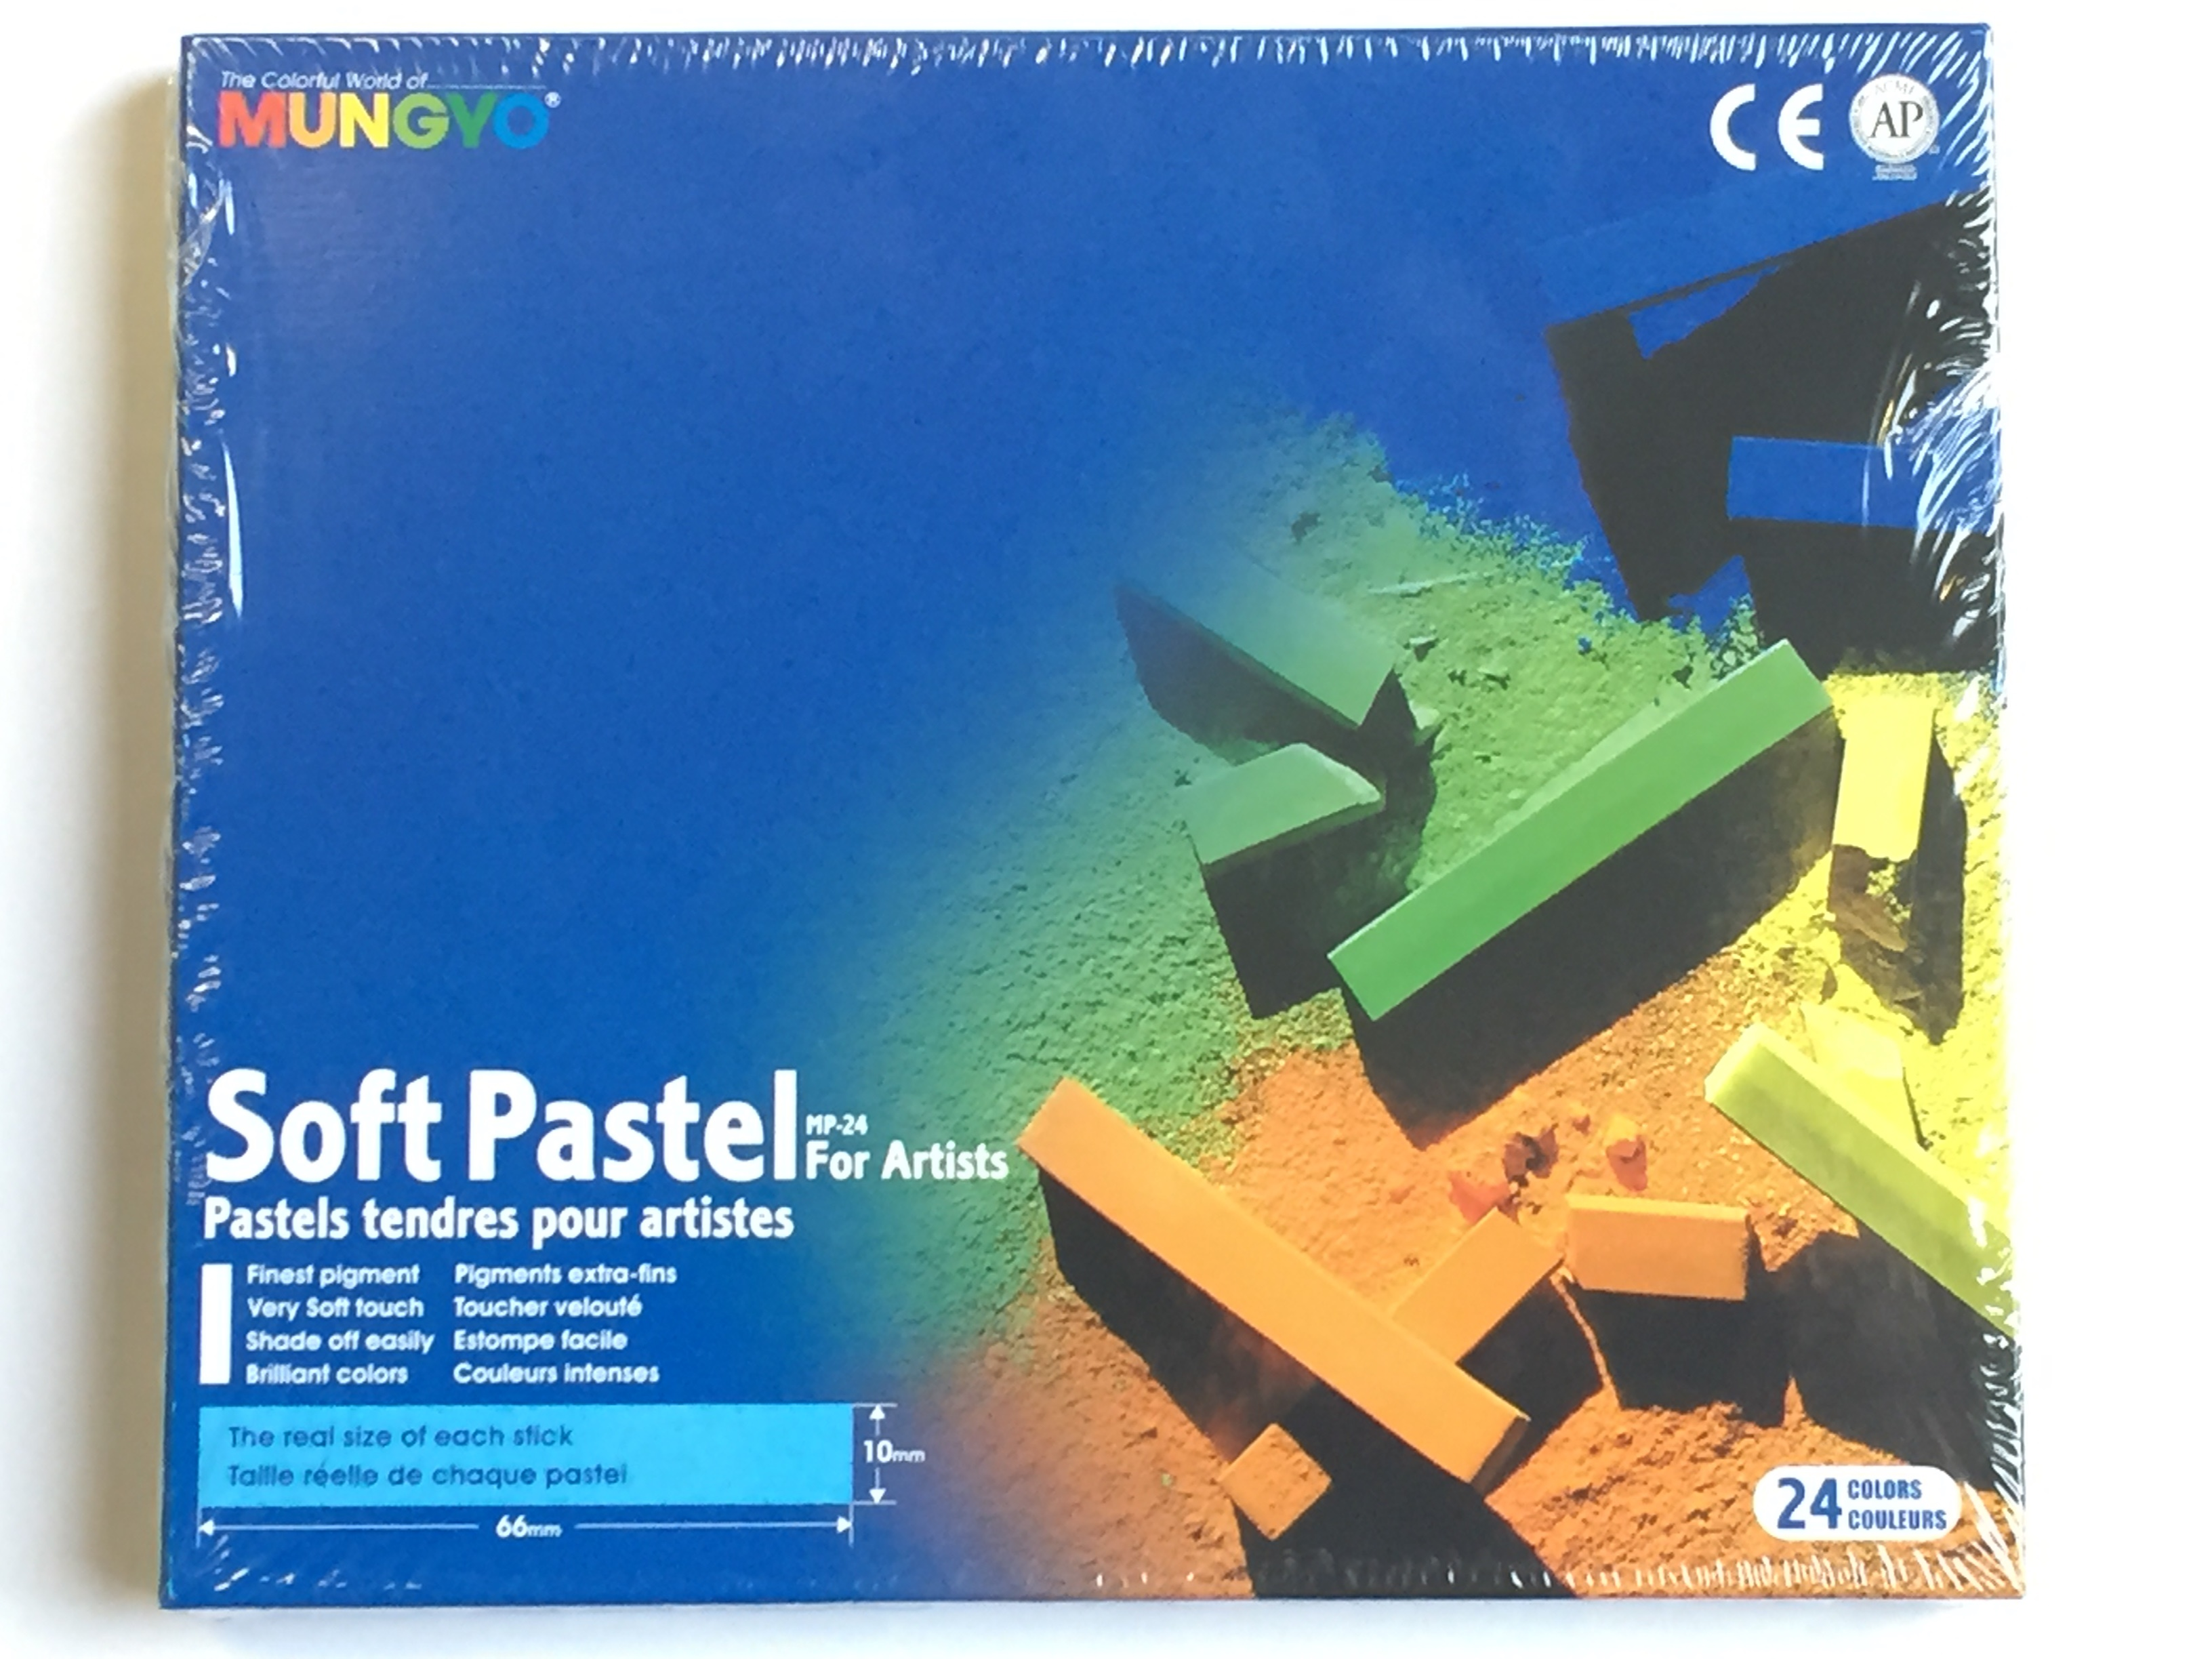 Mungyo MP24 Chalk Pastels Premium Soft